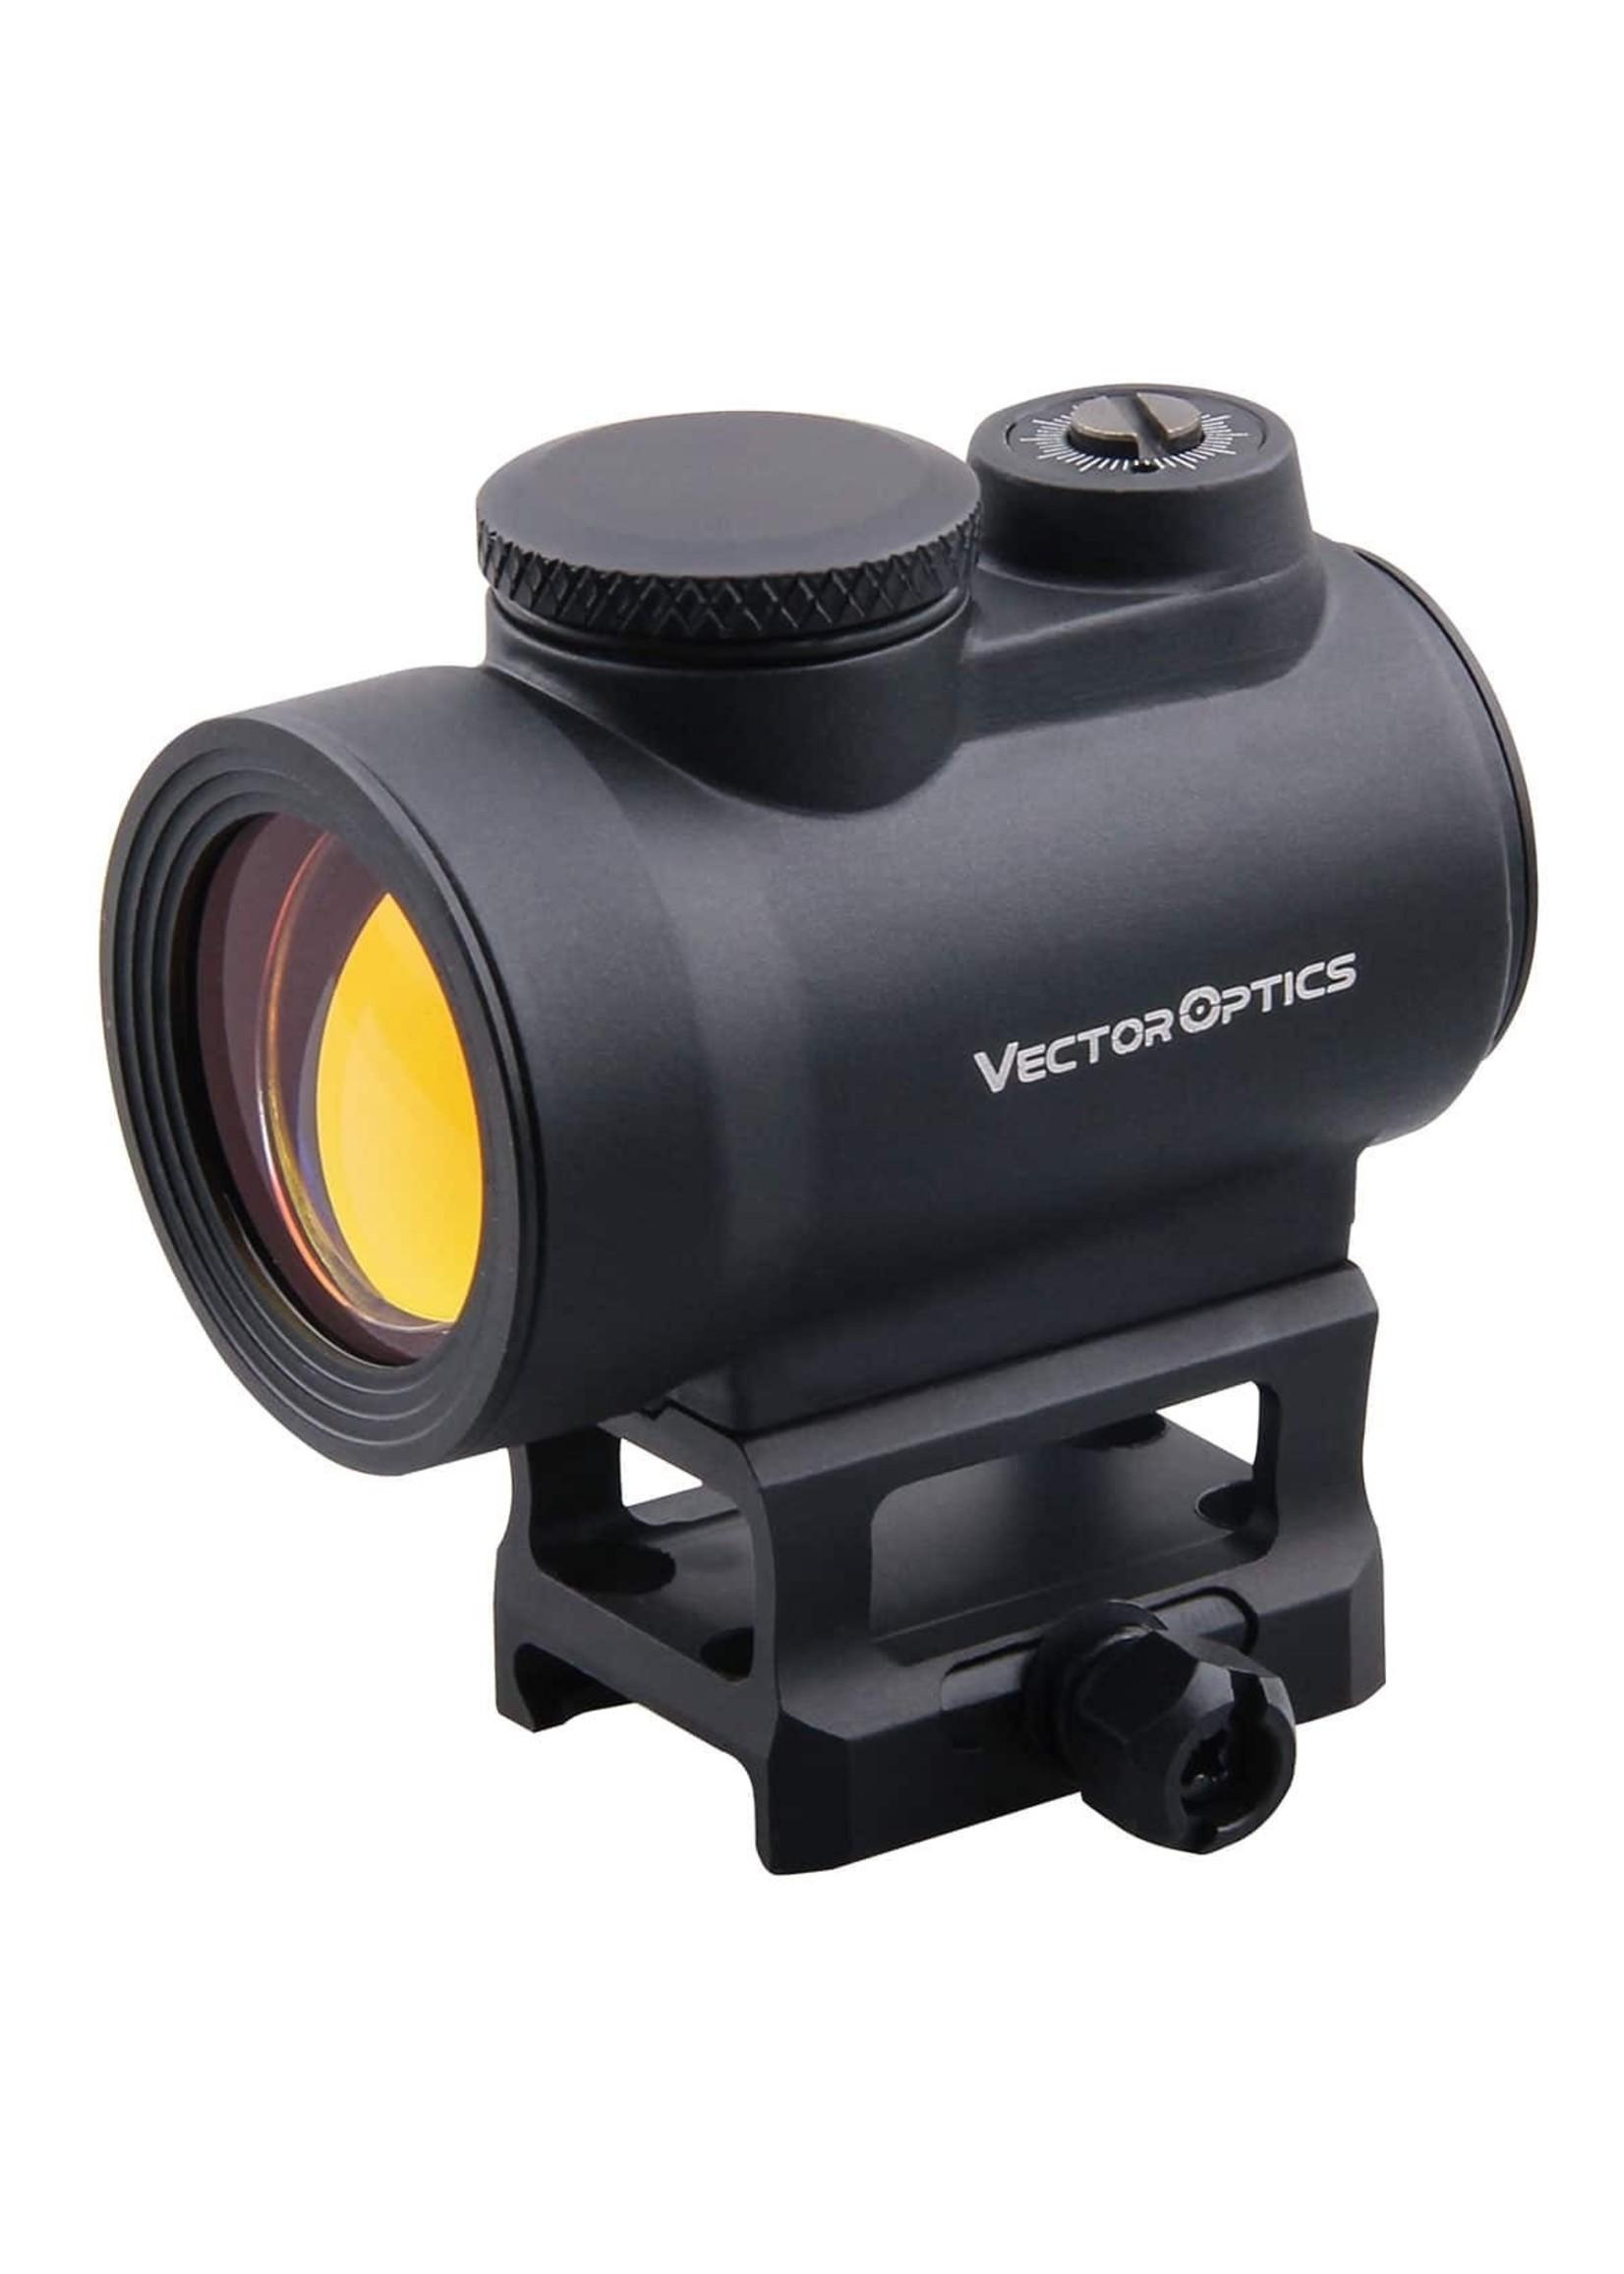 Vector Optics Vector Optics Centurion 1x30 Red Dot Sight